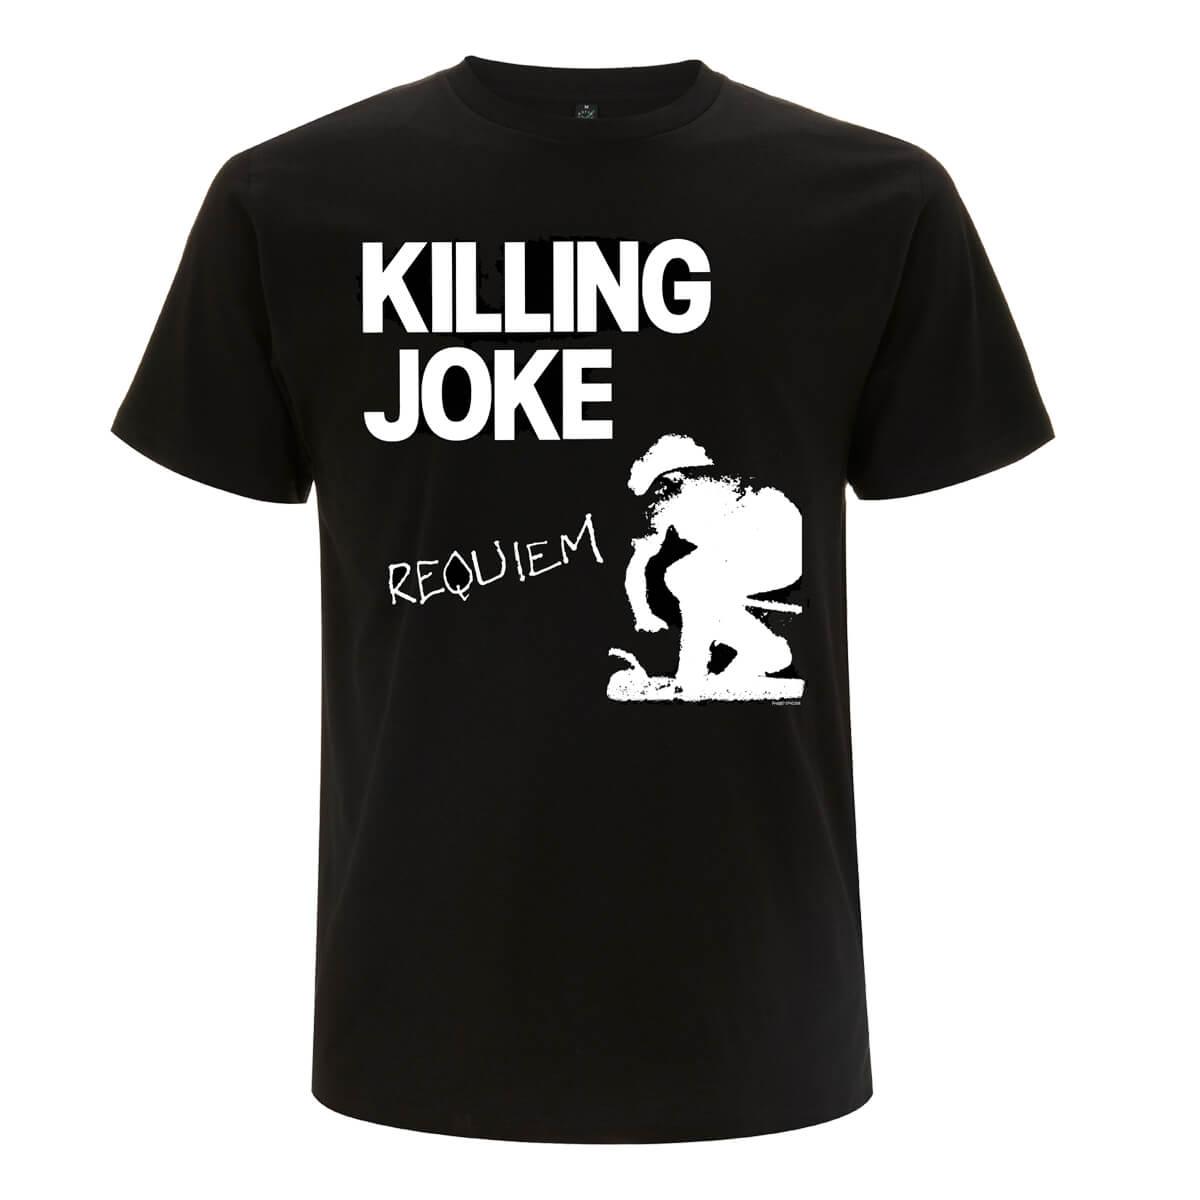 Requiem Black T-Shirt - Killing Joke